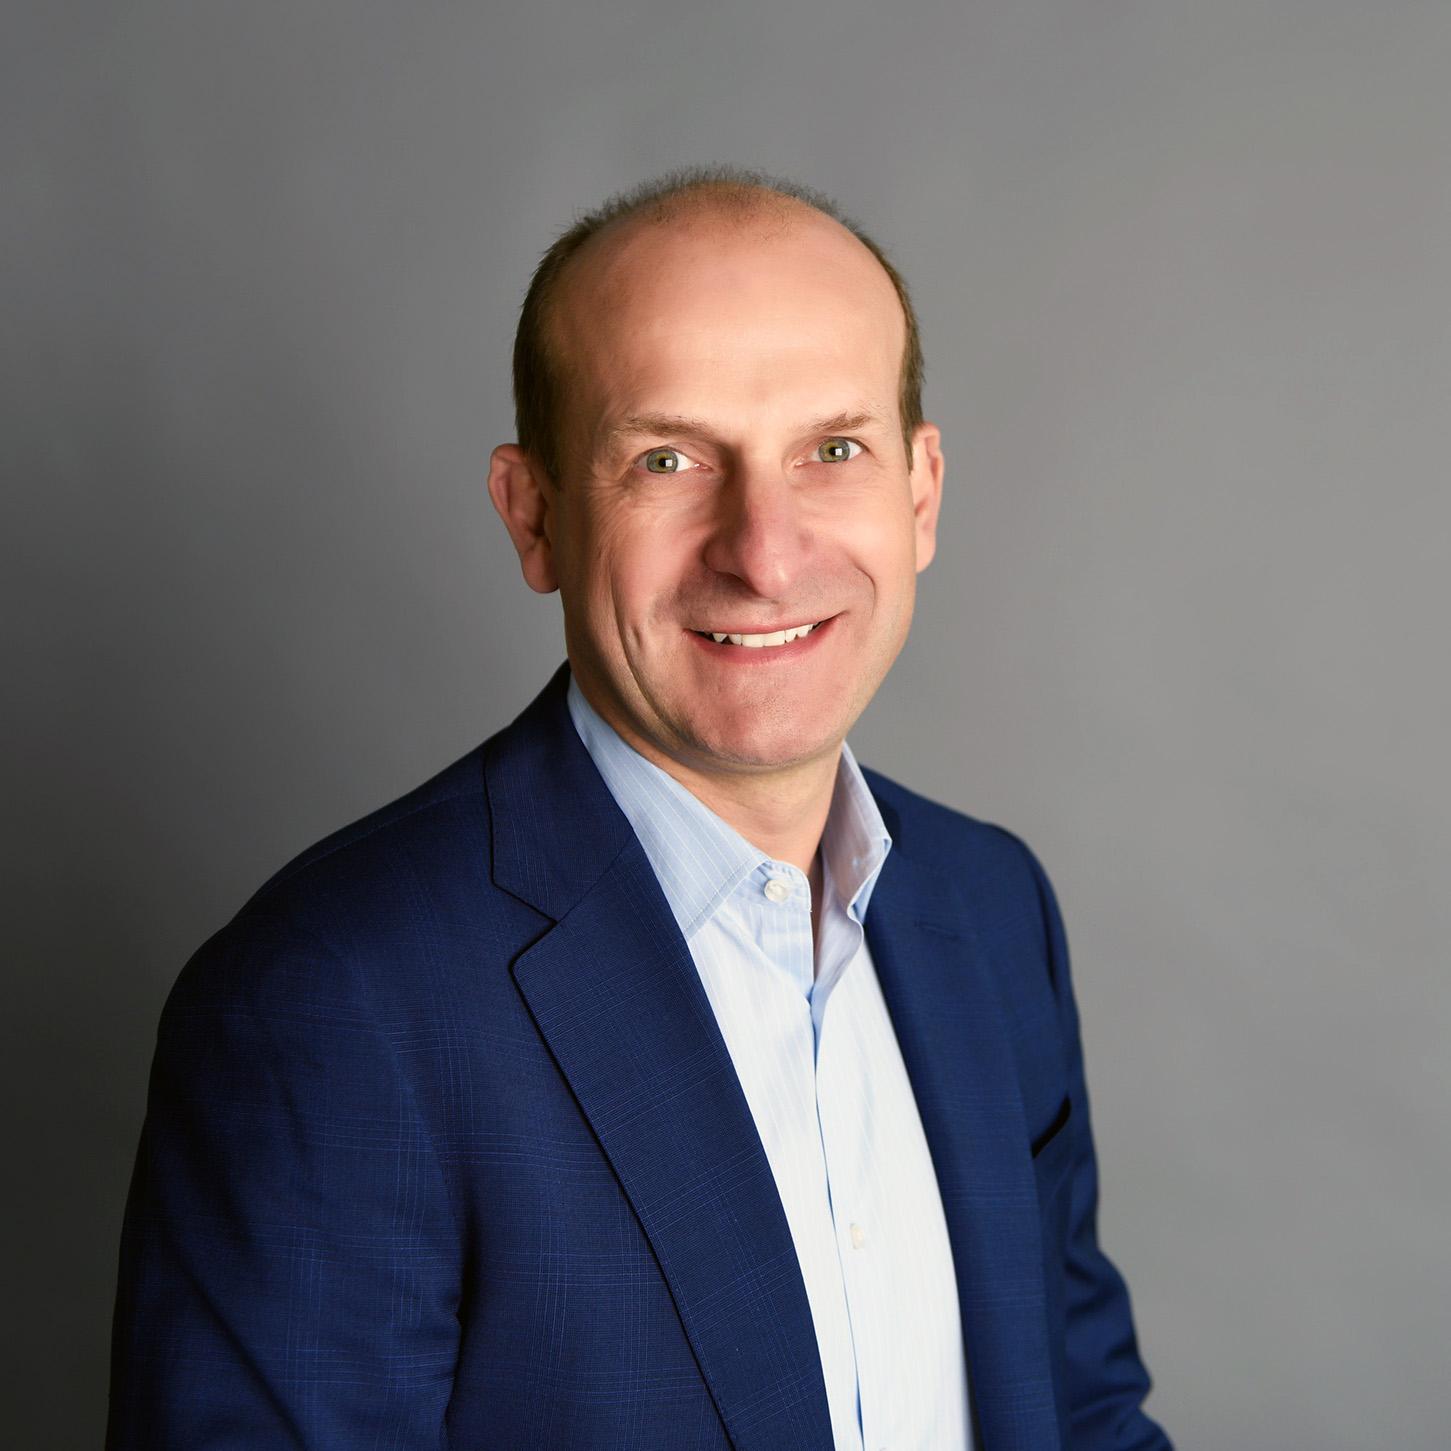 Koncerndirektør, Conscia Group Claus Thorsgaard